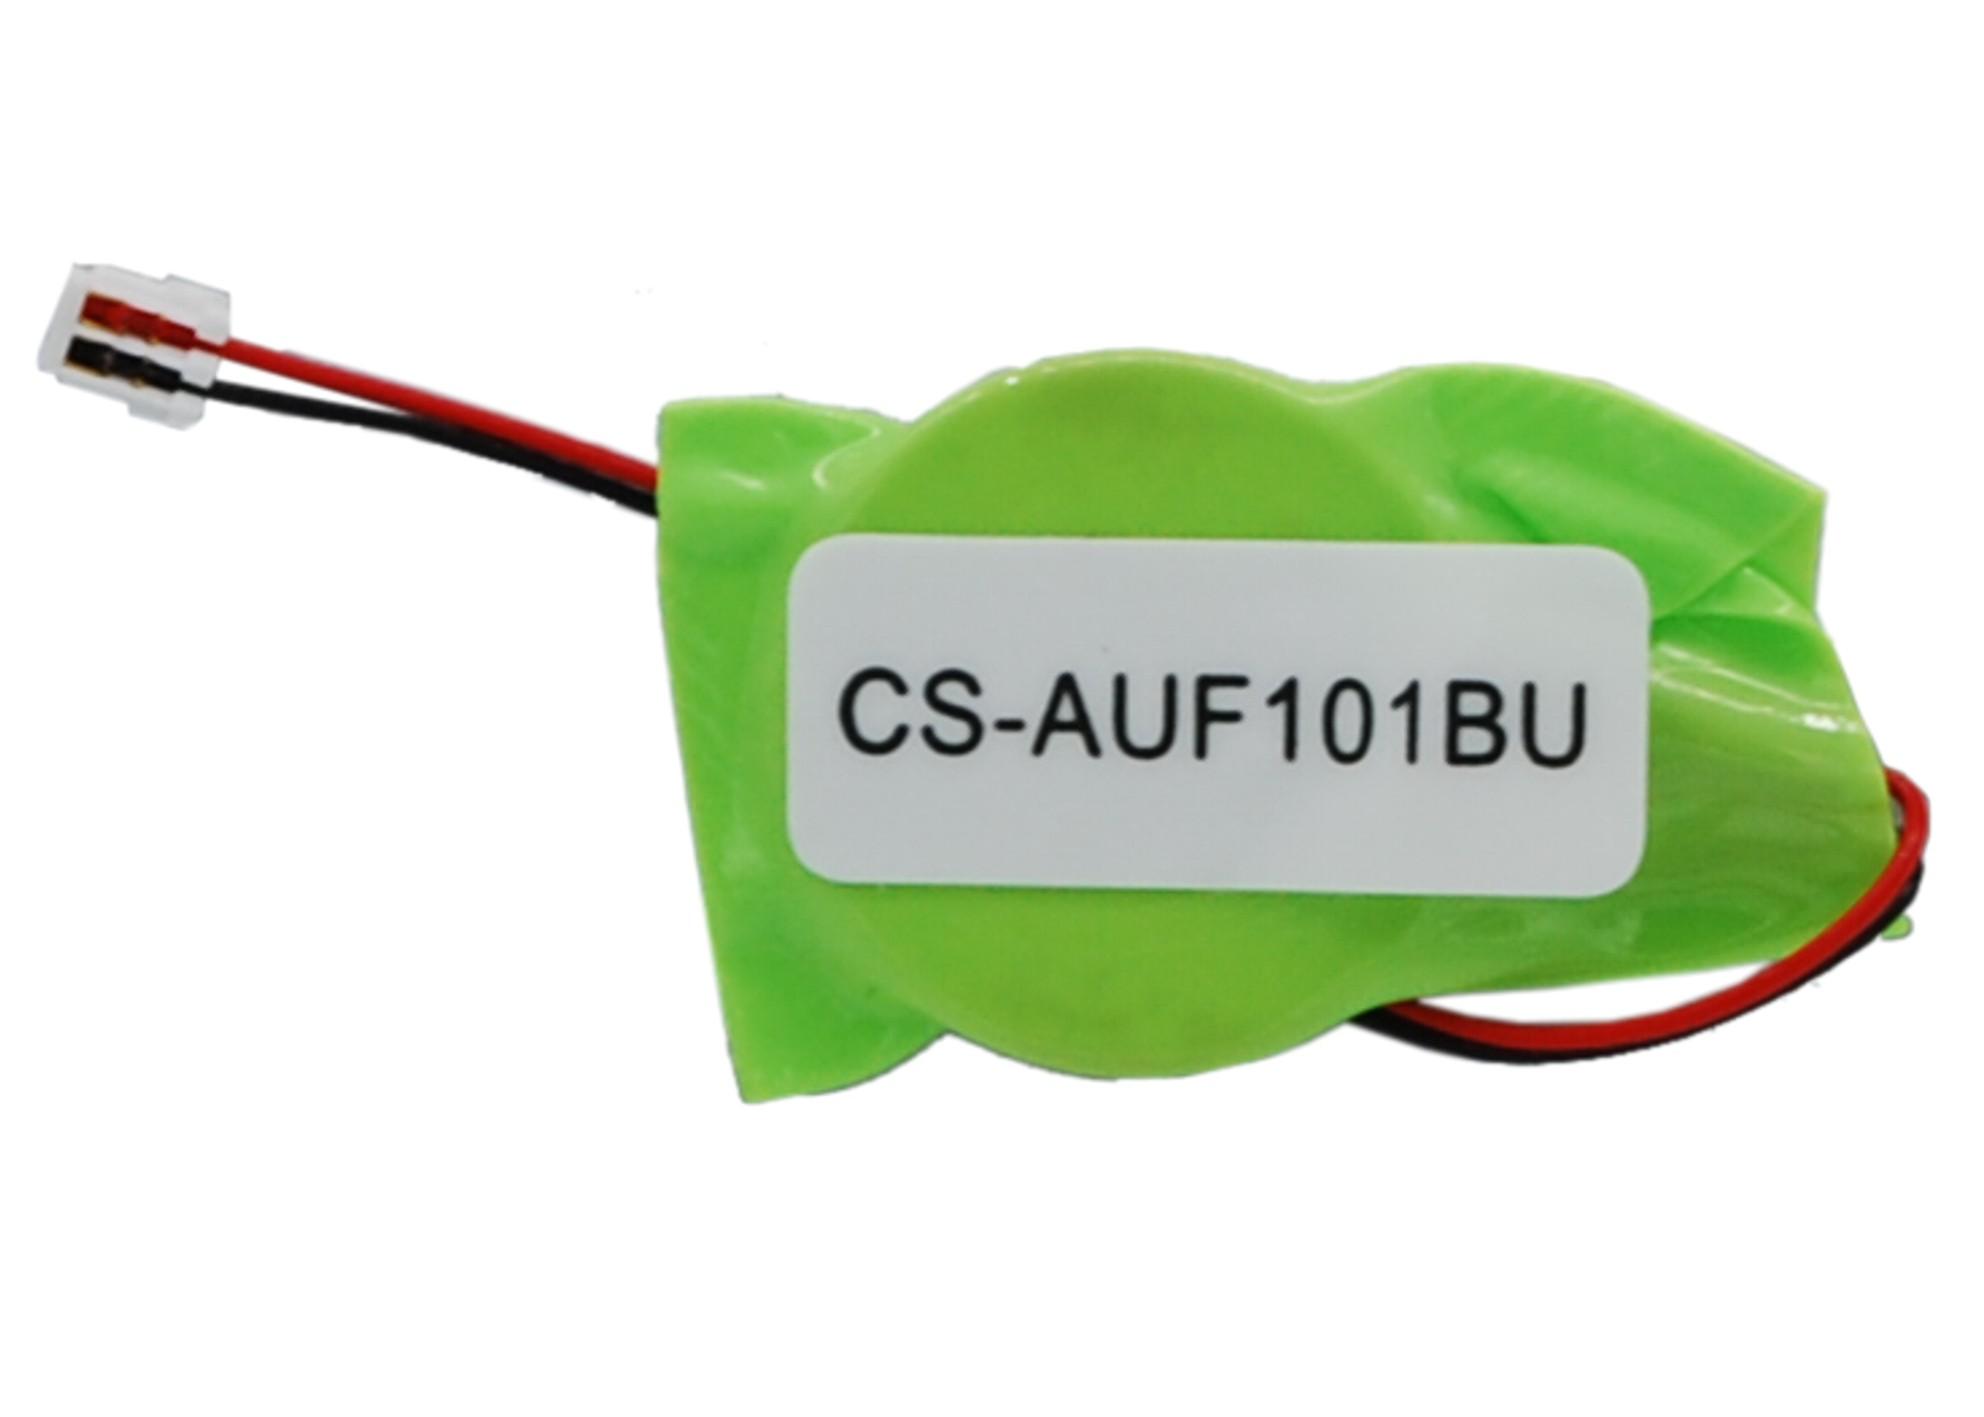 Cameron Sino baterie cmos pro ASUS Eee Pad Transformer TF101-1B002A 3V Li-ion 40mAh zelená - neoriginální